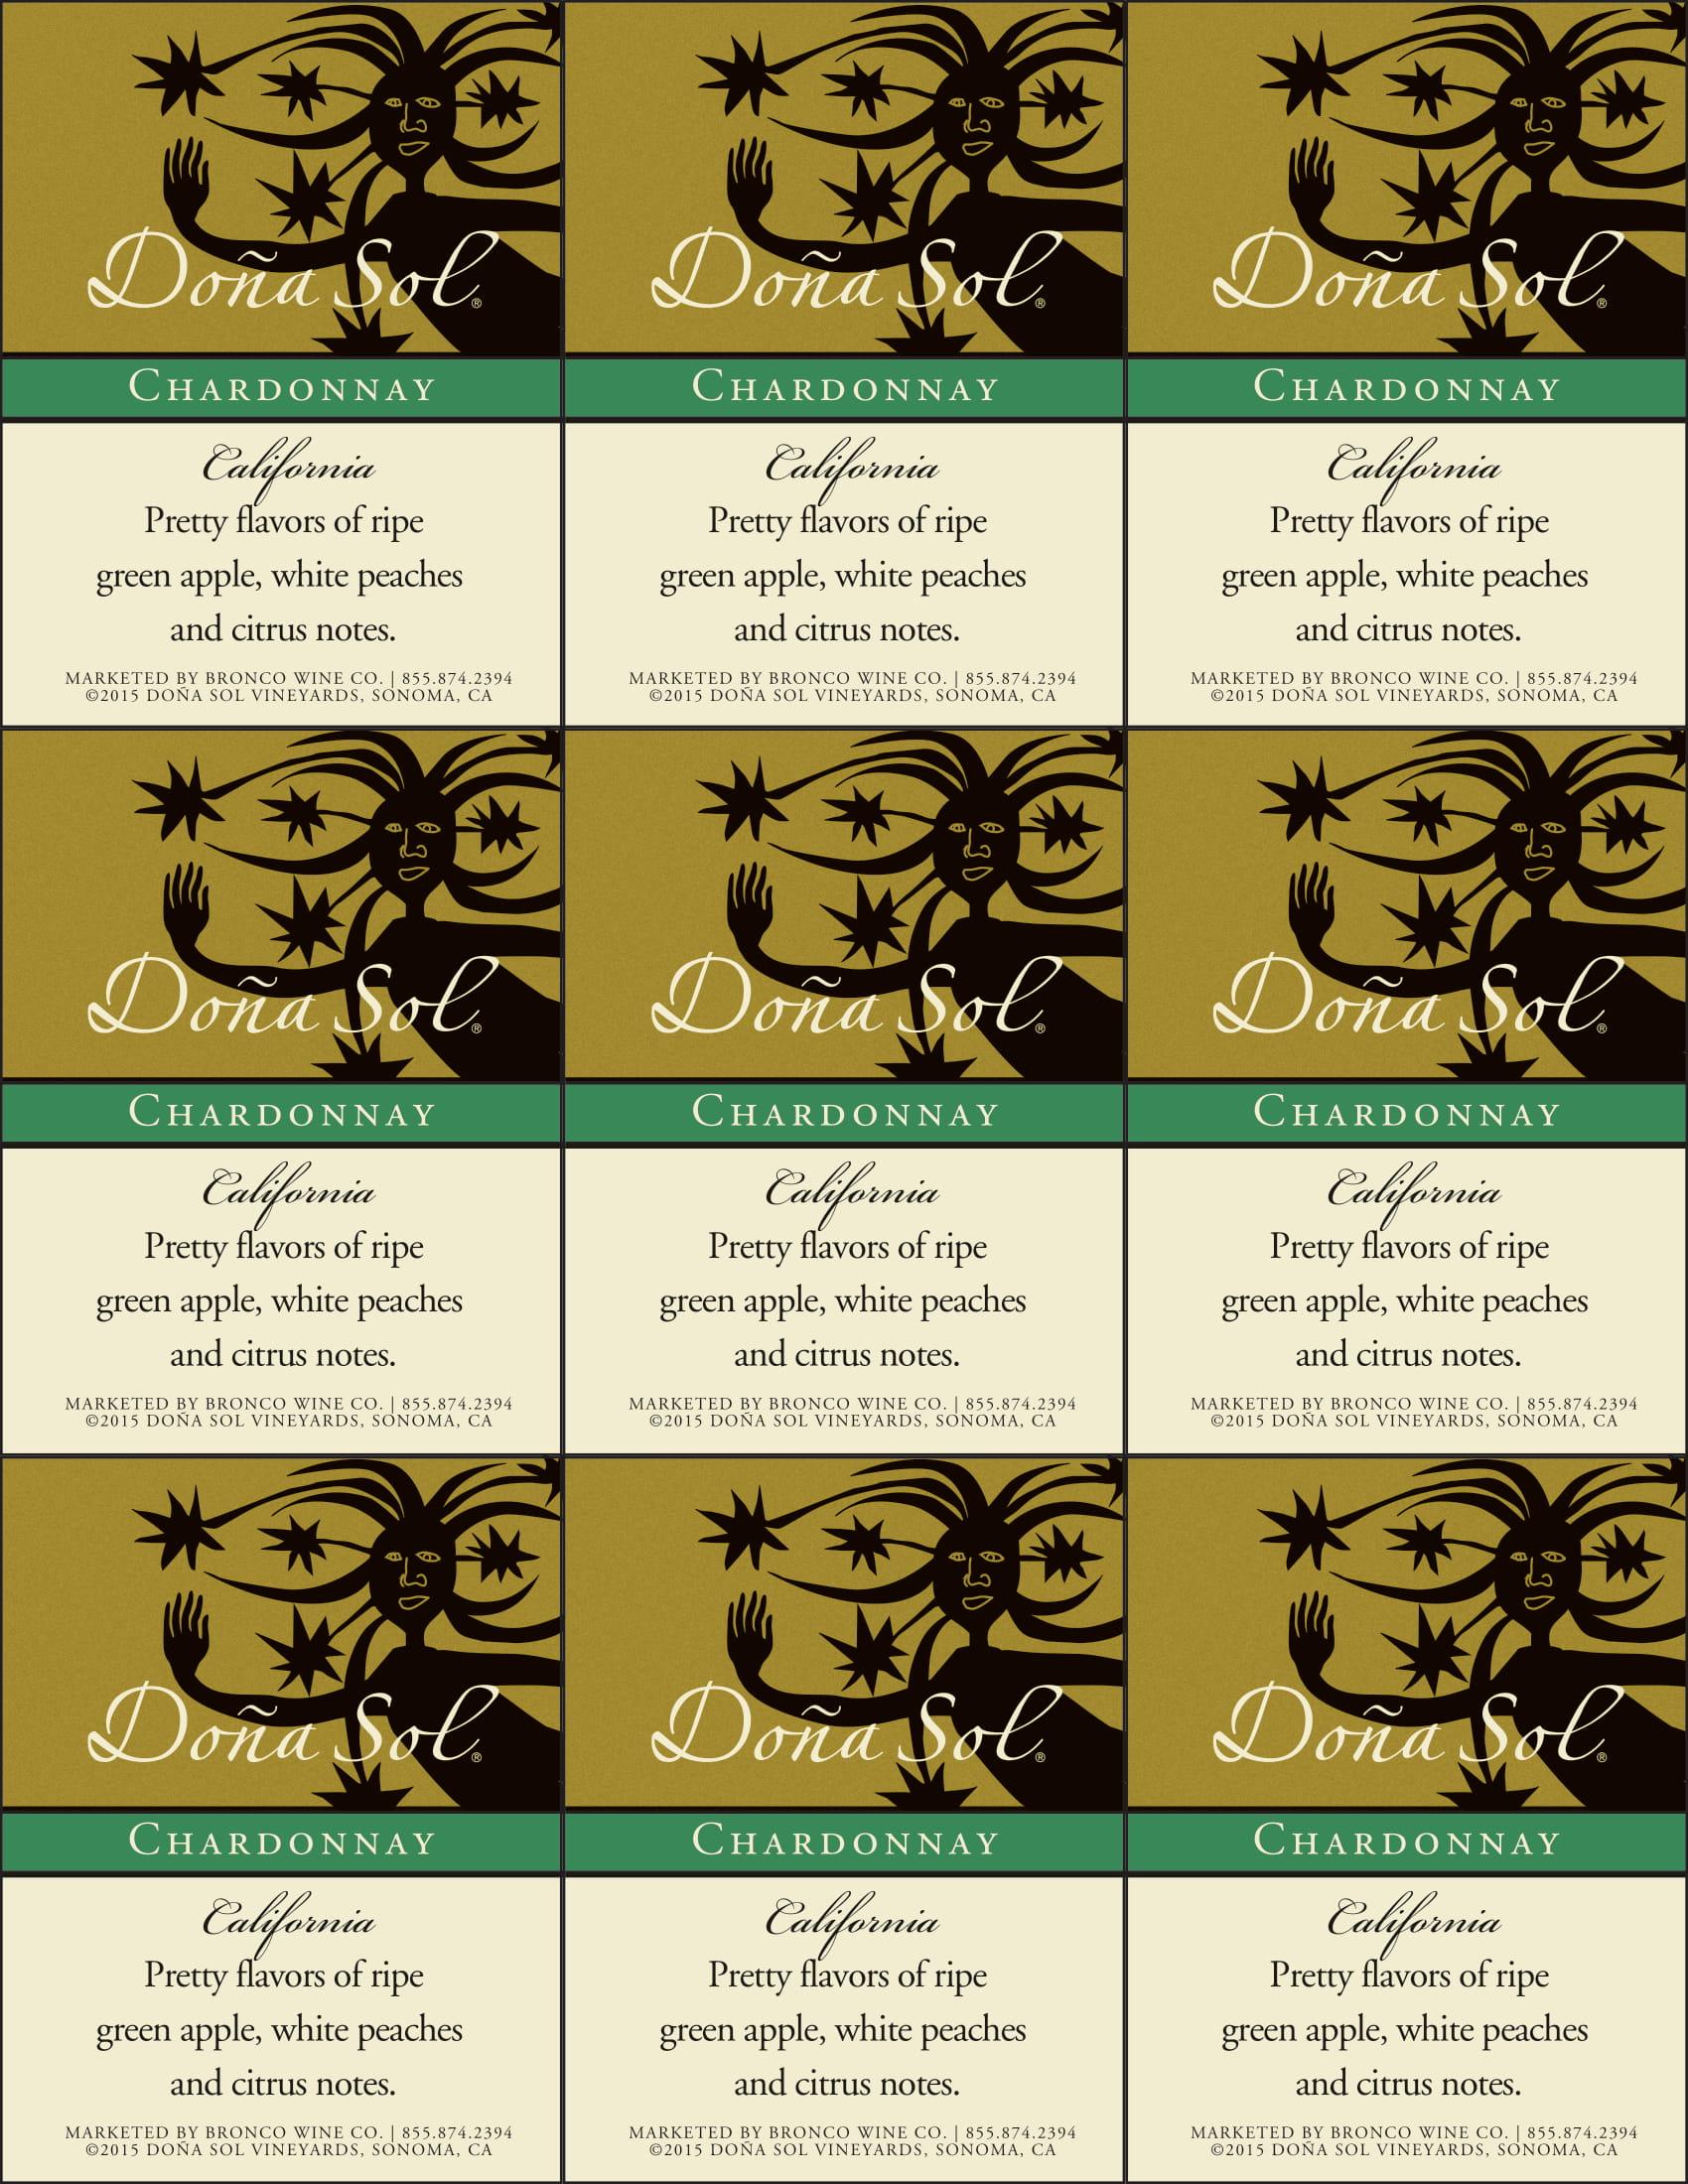 Dona Sol Chardonnay Shelf Talkers